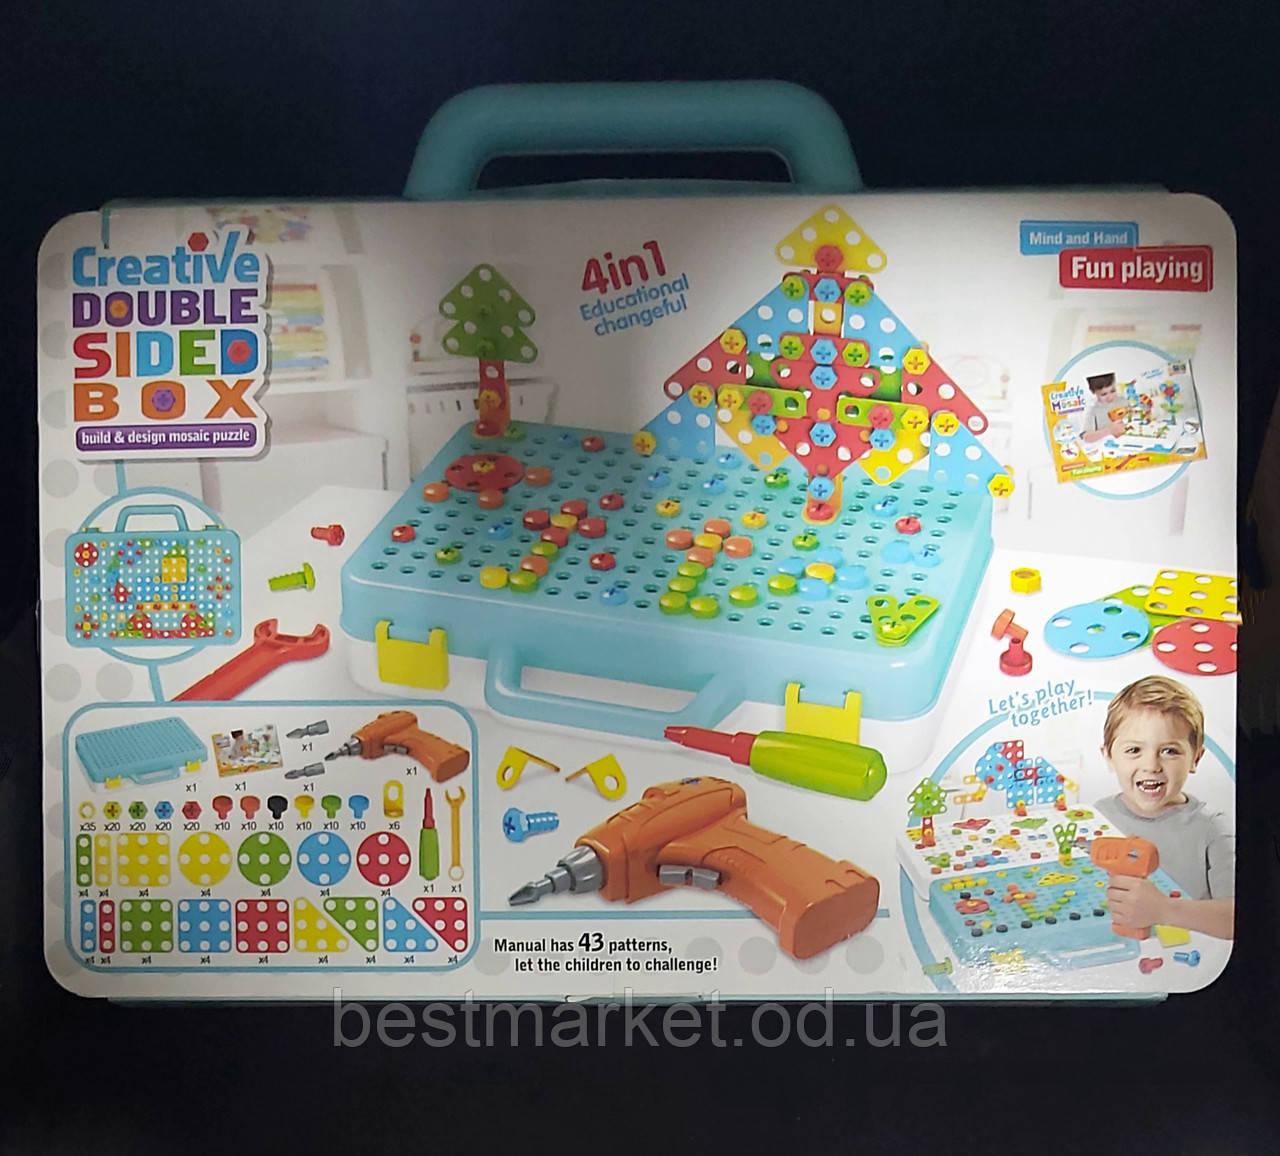 Детский Конструктор Винтовая Мозаика с Шуруповертом Creative Double Sided 4 в 1 Box 252 Элементa